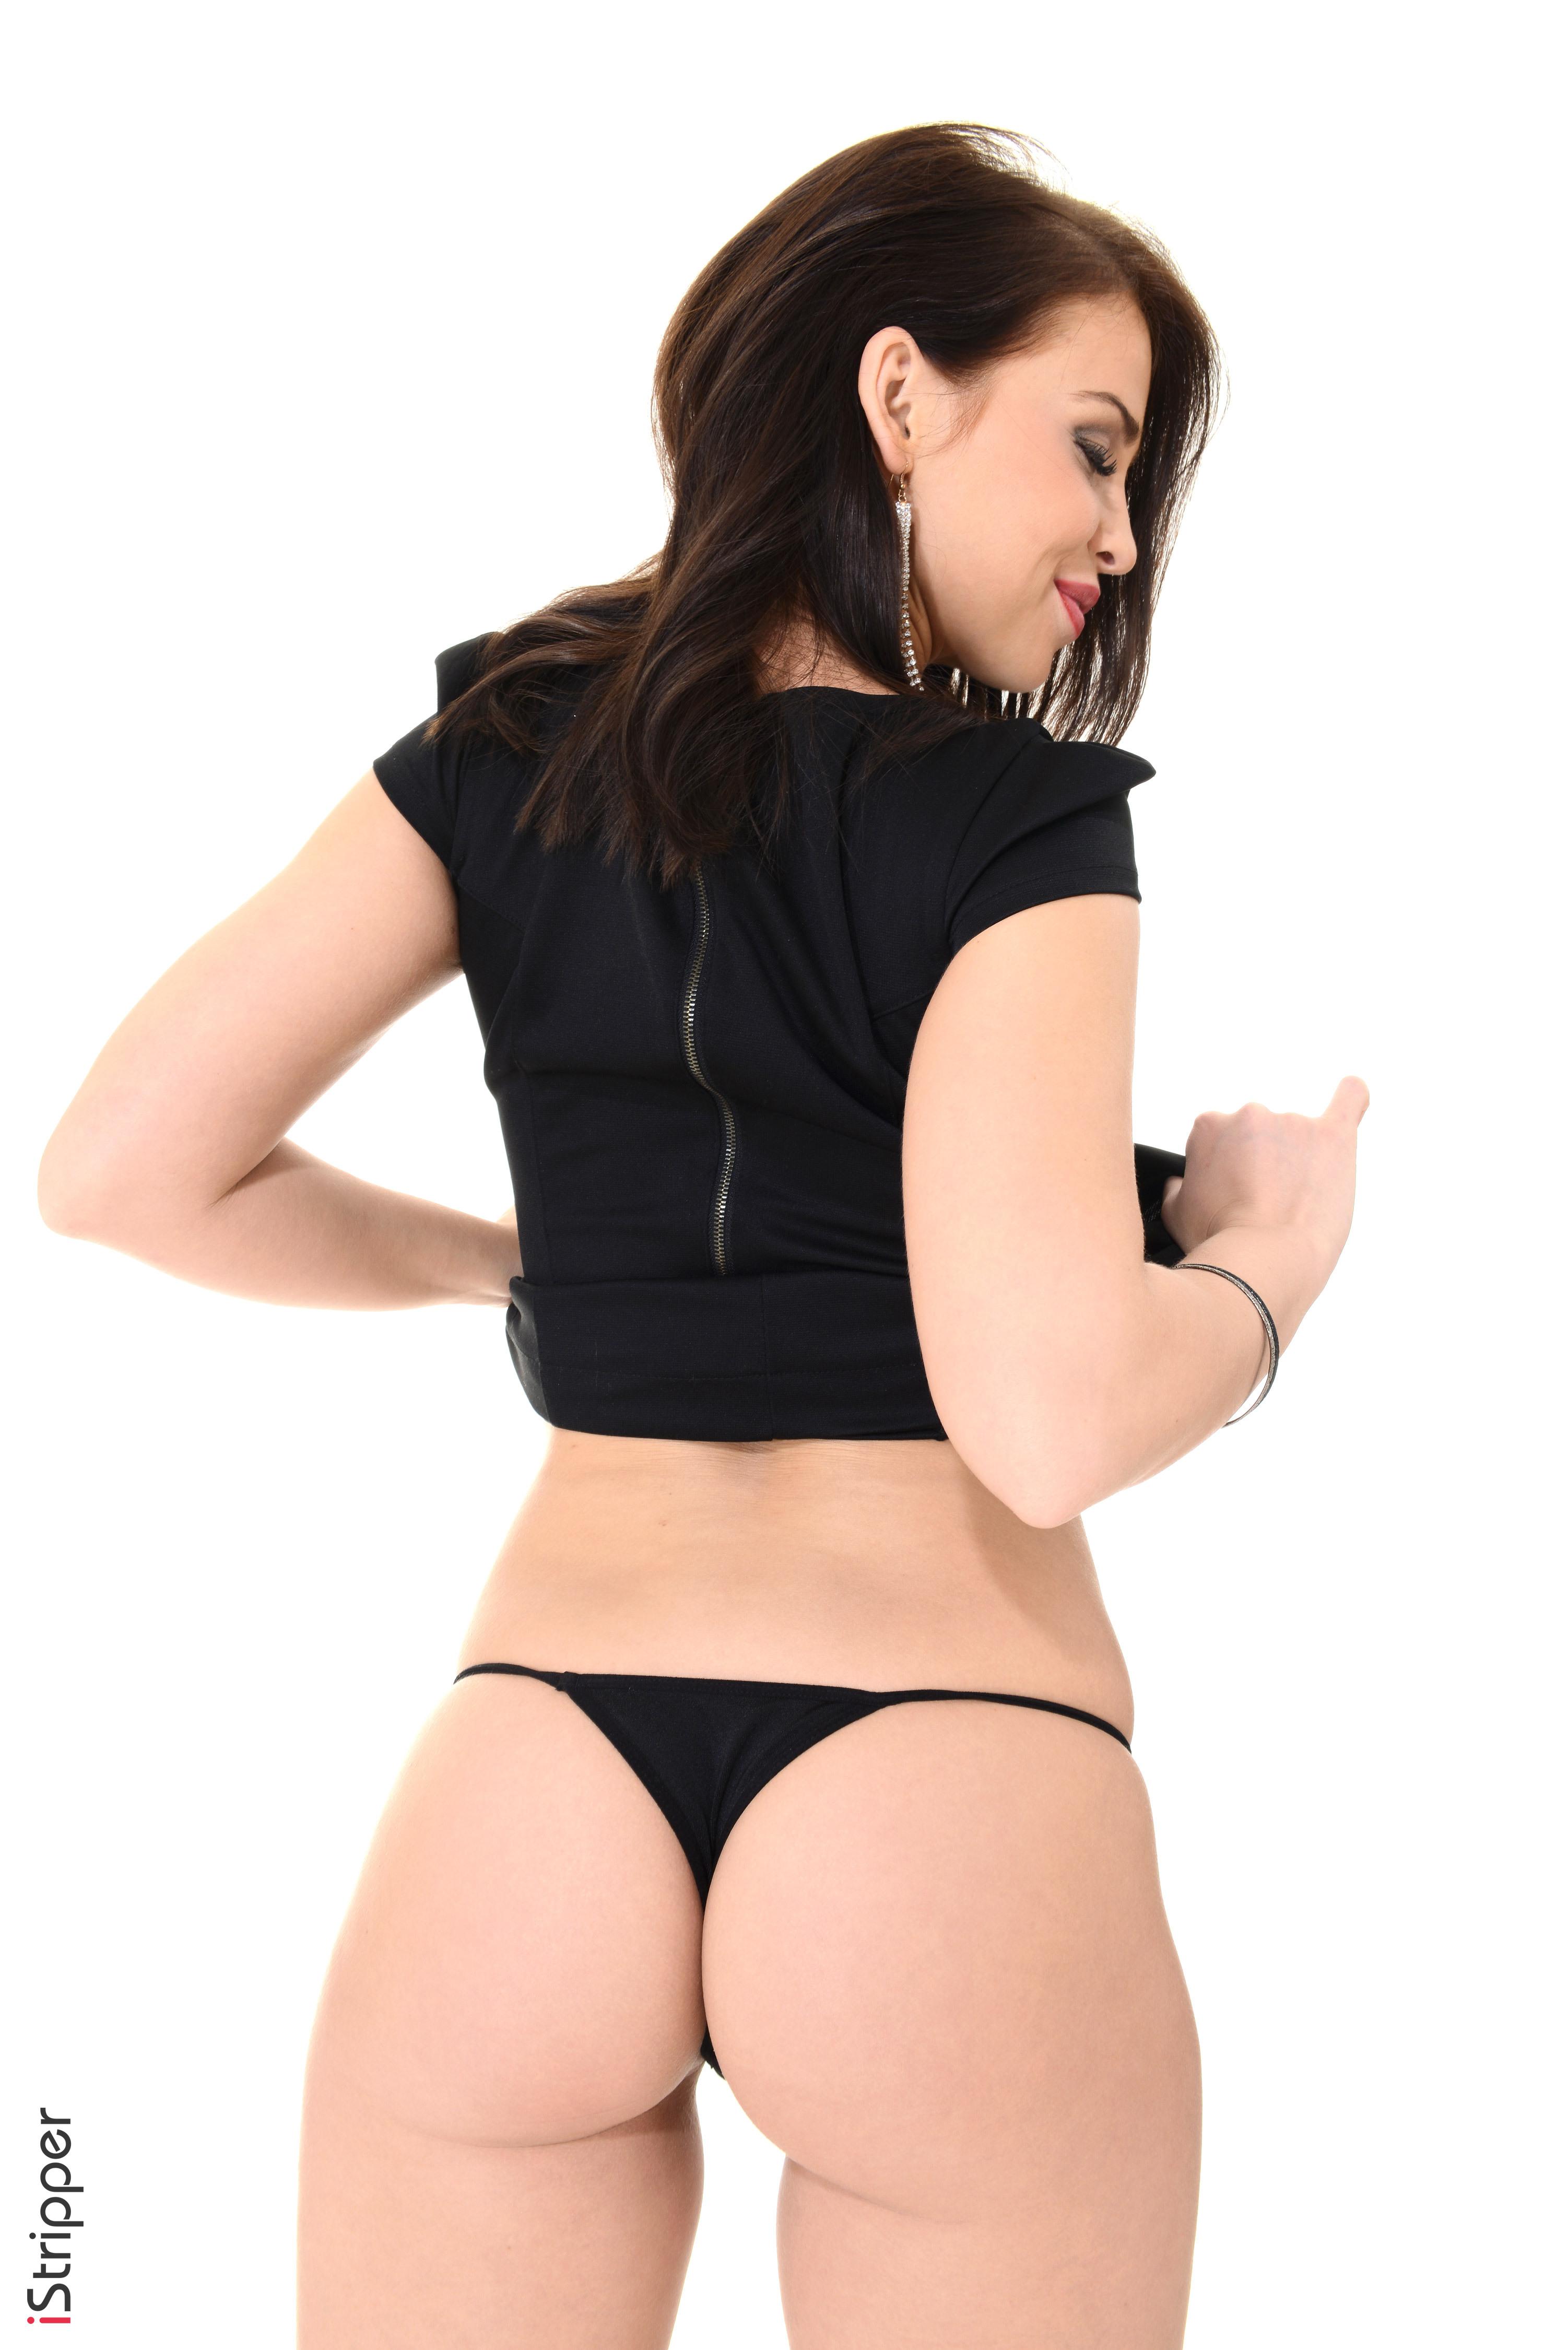 virtua girl desktop stripper